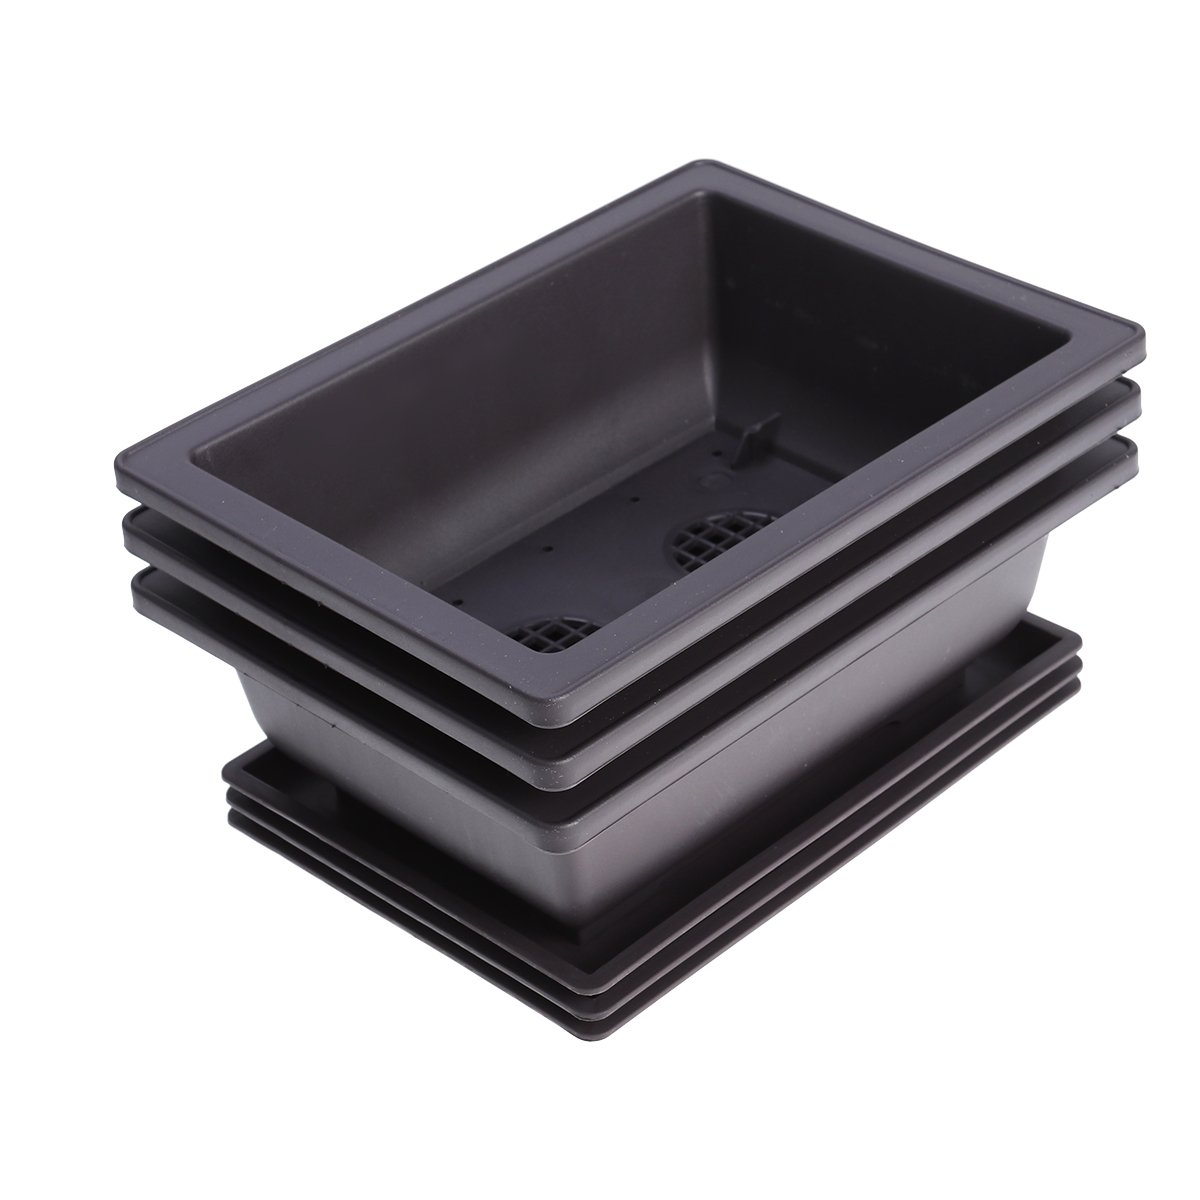 Yardwe 3 PZ Vasi di plastica per Piante rettangolari vasi da Balcone Vasi Succulente di plastica Vasi da Giardino 2,75 x 2,95 x 2,95 Pollici Marrone Scuro